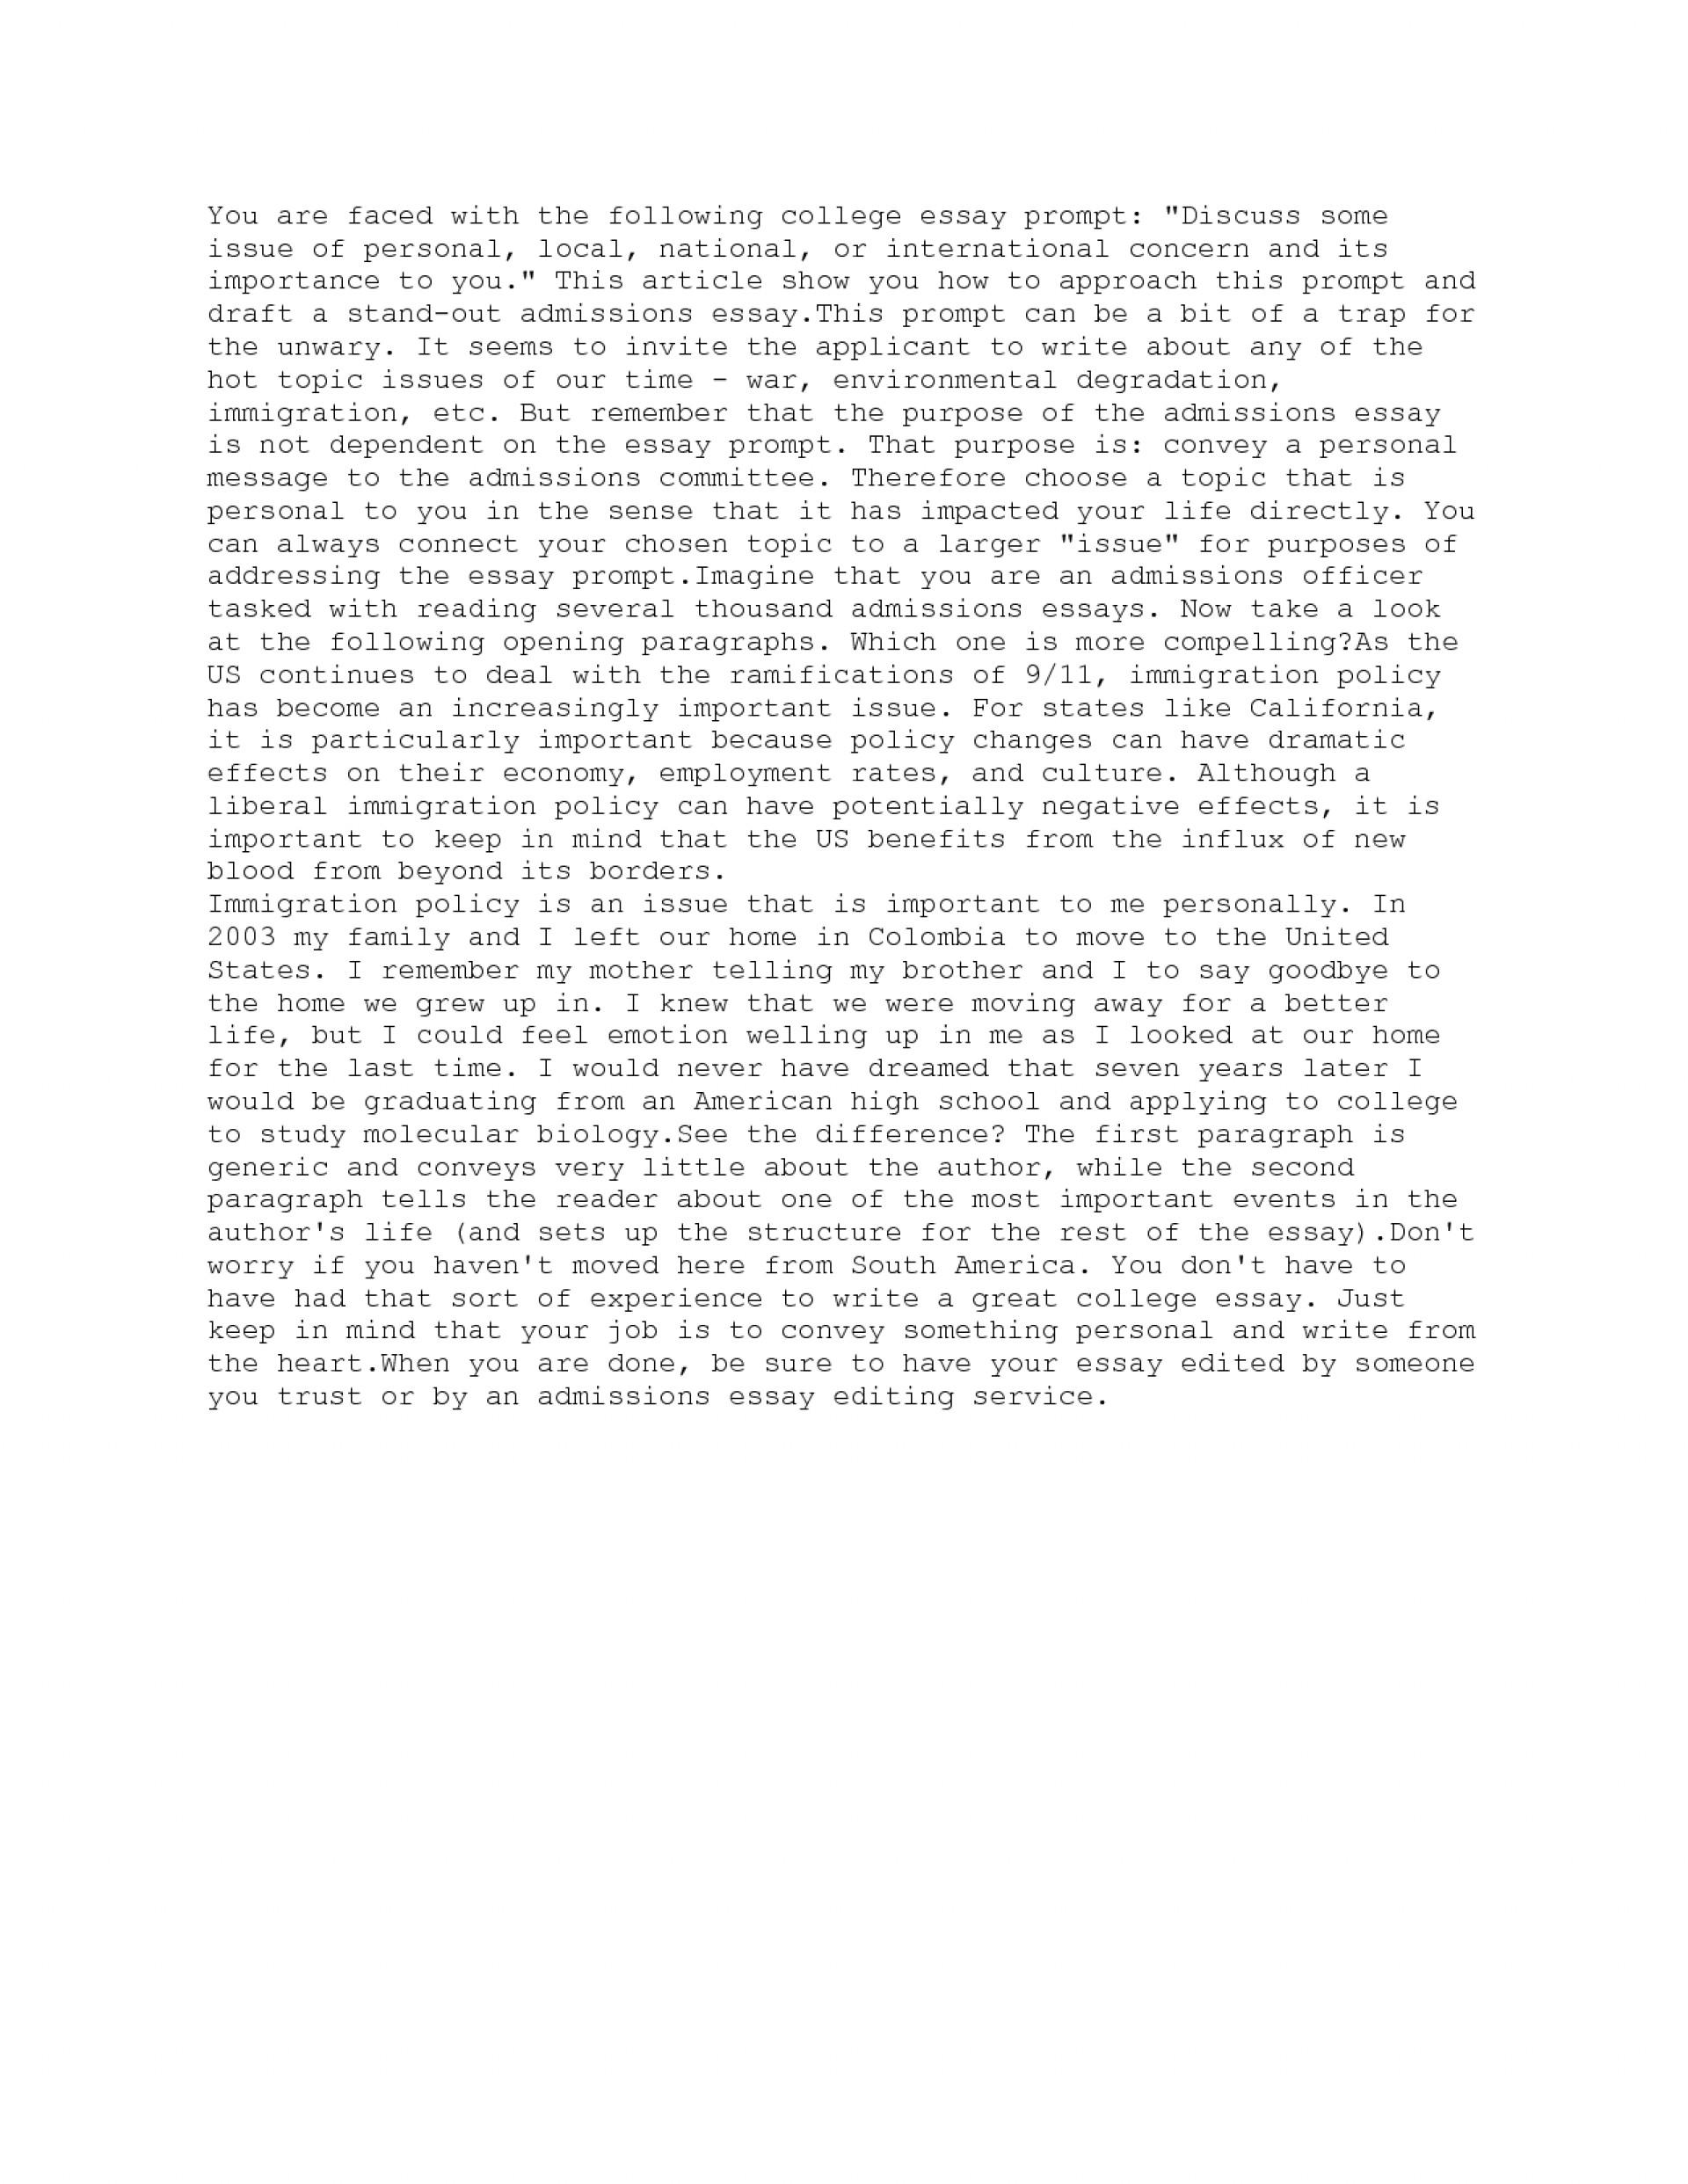 004 Essay Example Common App Essays Best Application Examples Harvard Prompts 2014-15 1920